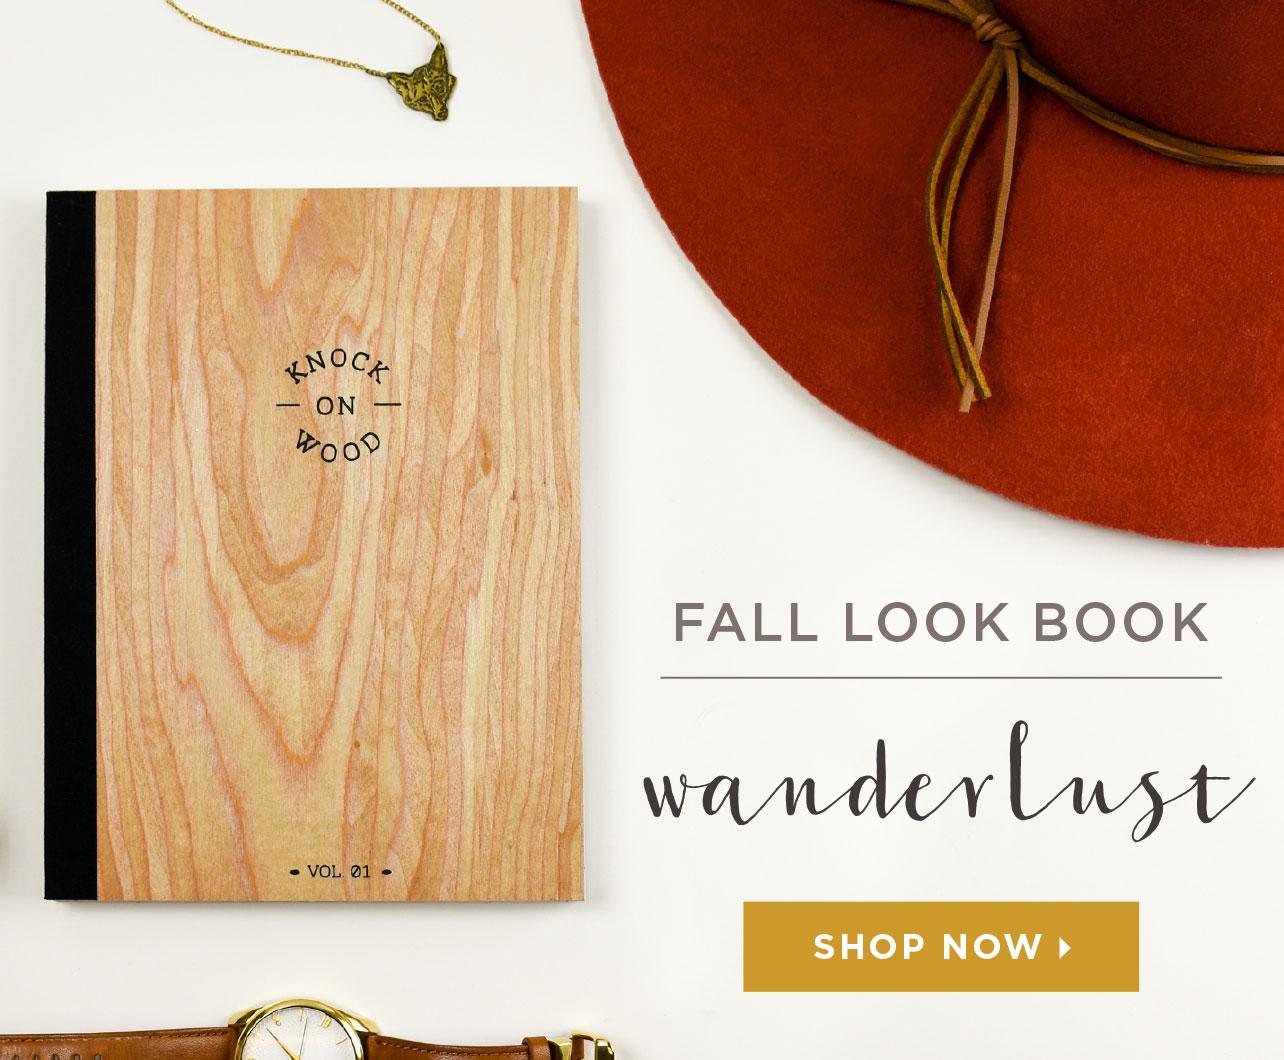 Elum Fall Look Book: Wanderlust